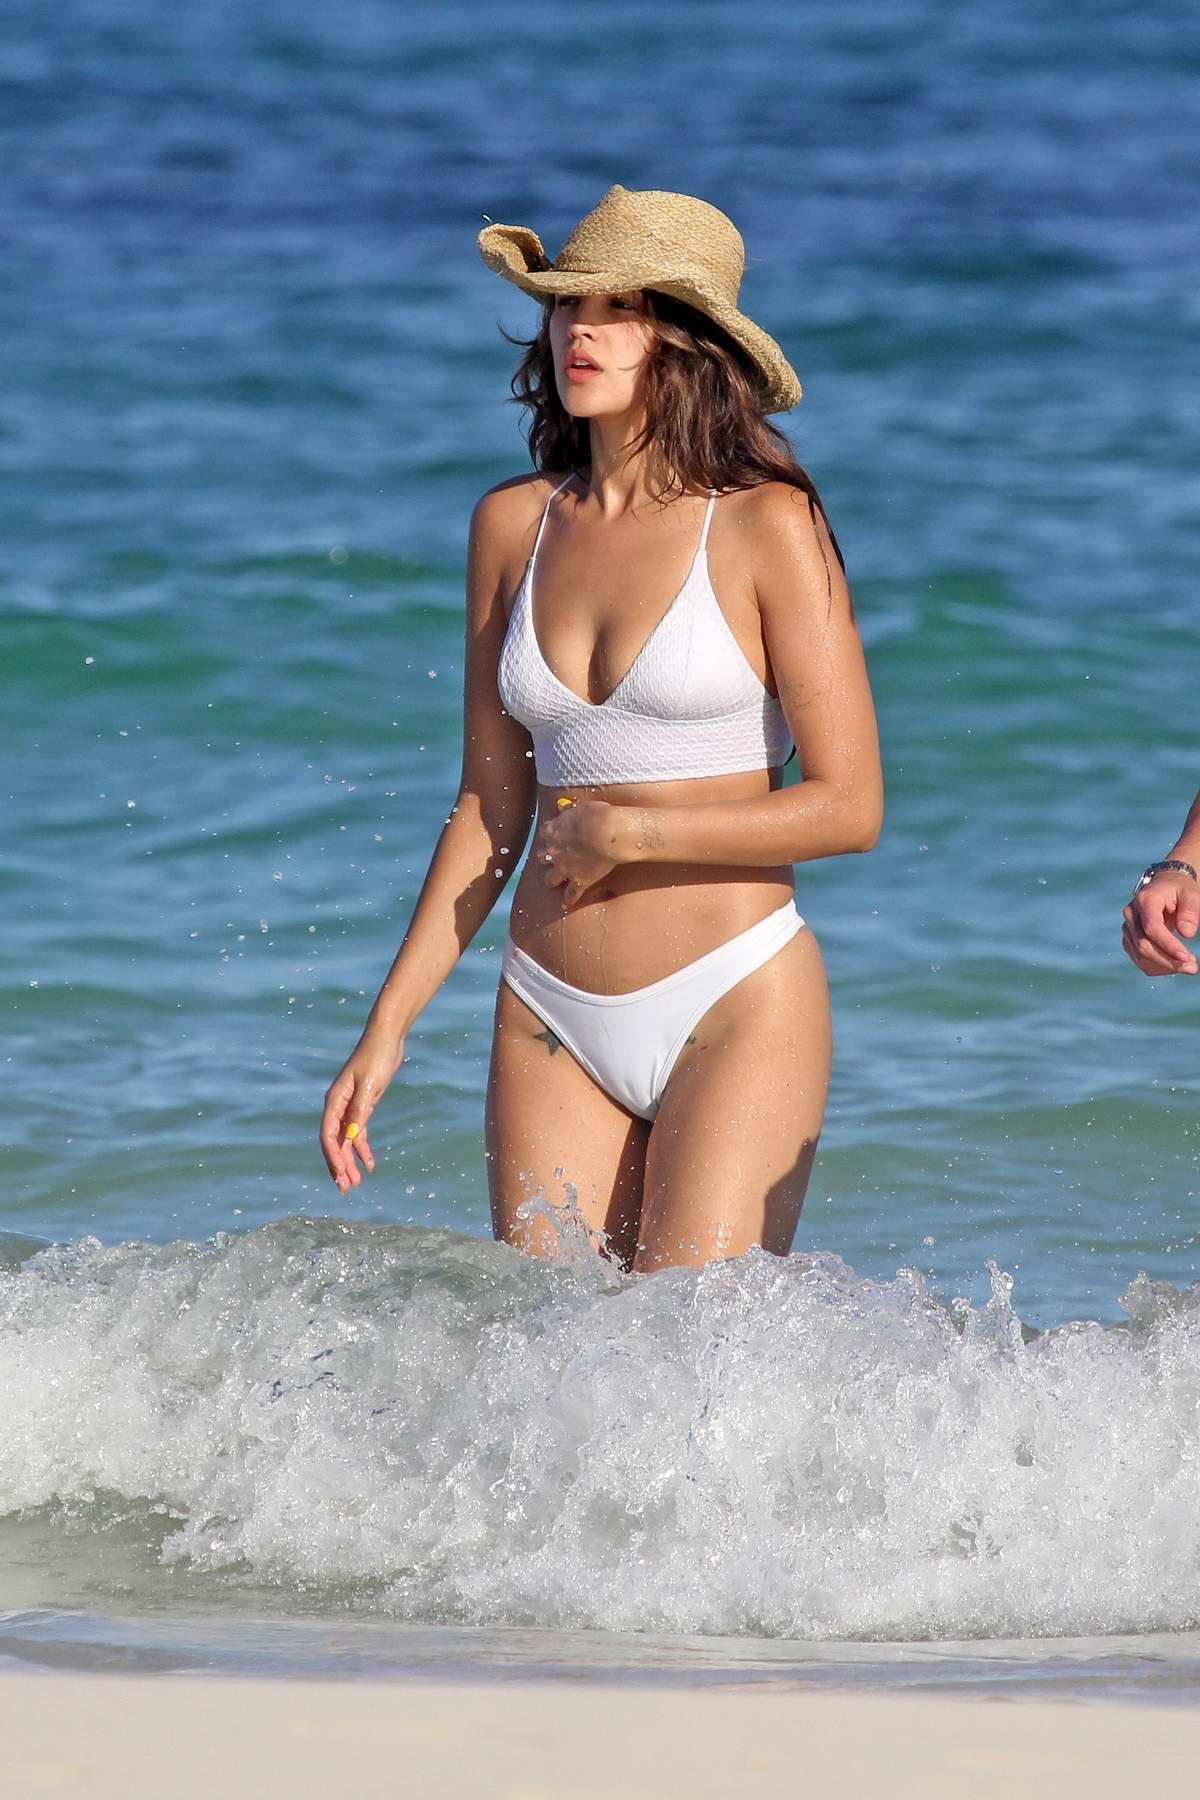 Eiza Gonzalez sports a white bikini while enjoying the beach with Luke Bracey in Tulum, Mexico